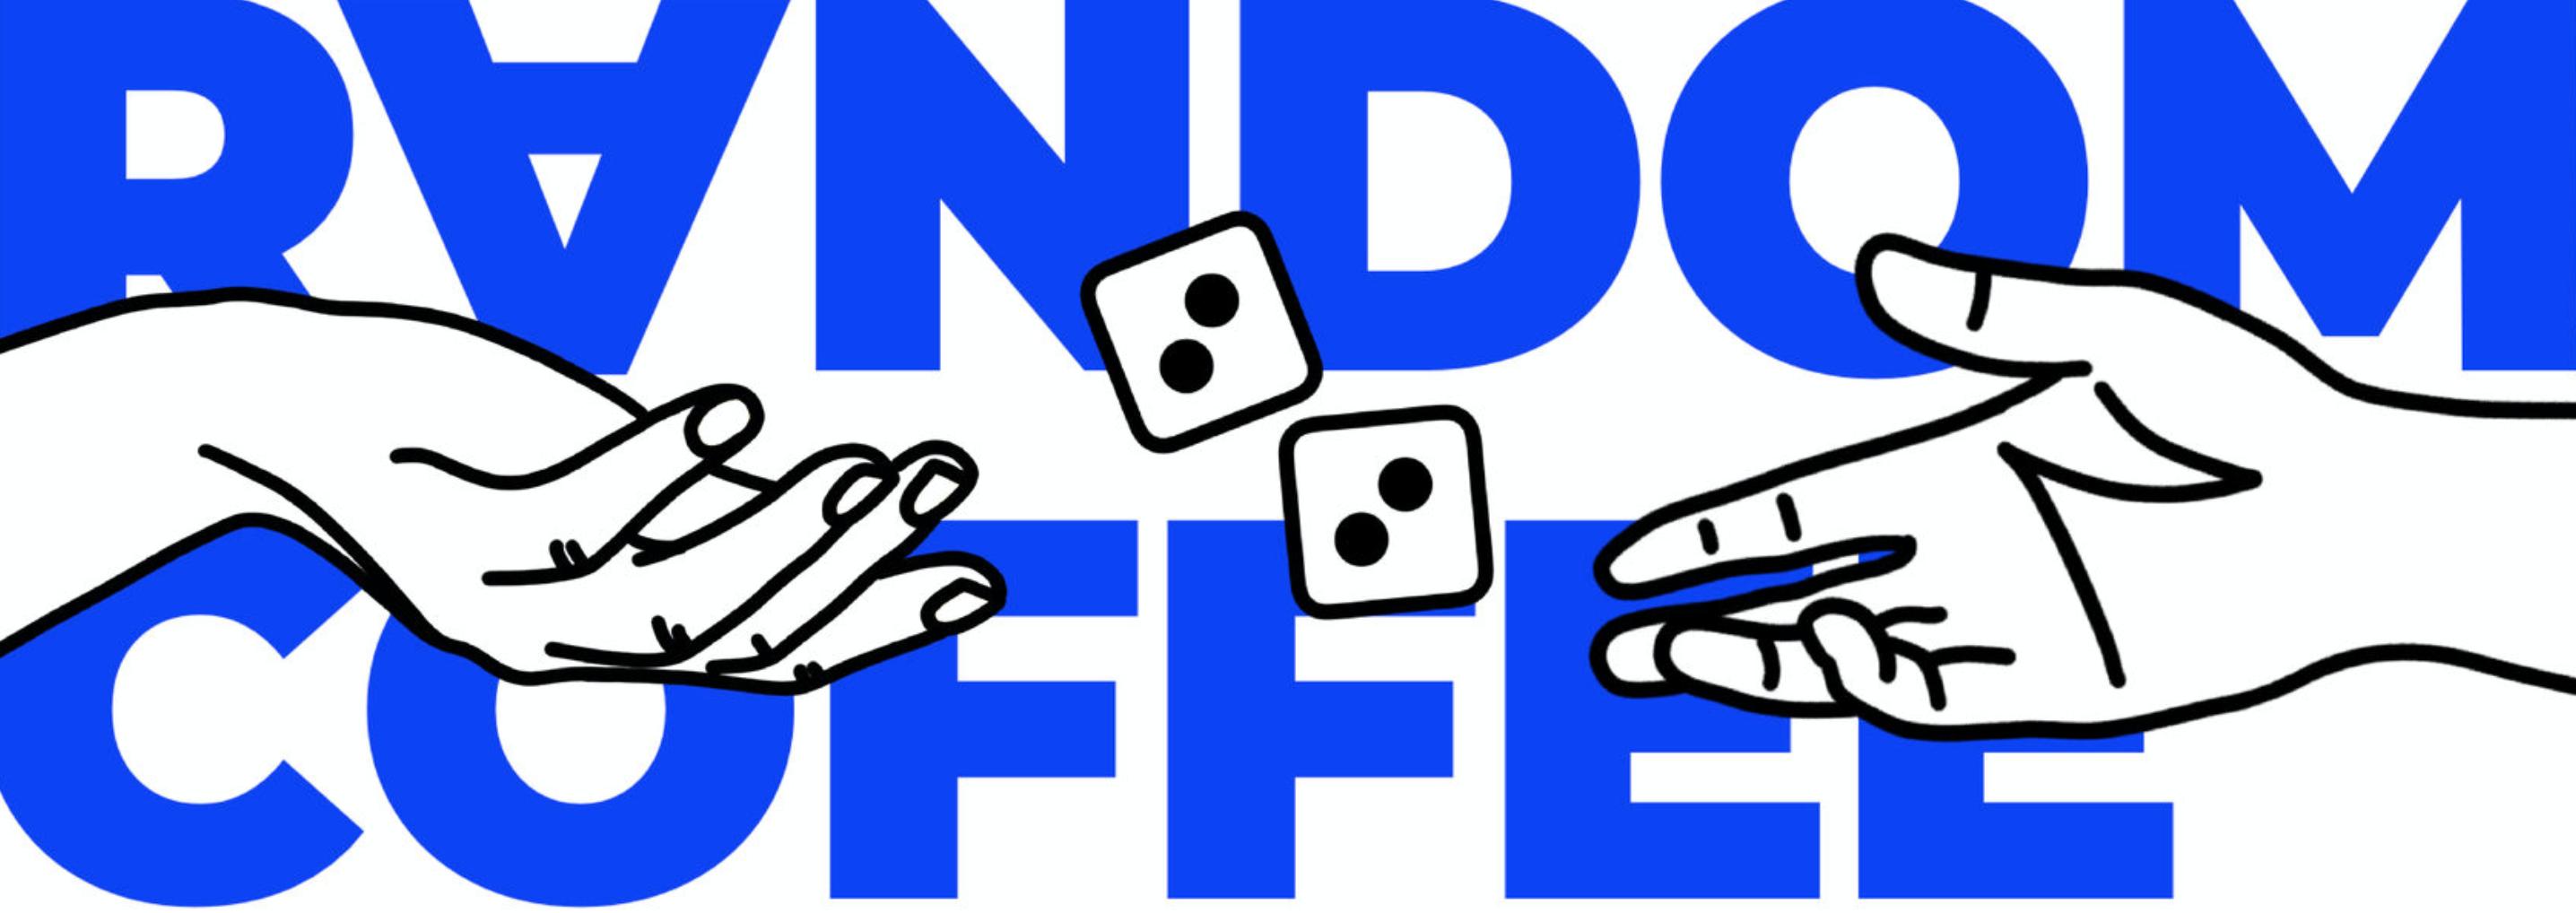 Random Coffee Habr Edition — нетворкинг для IT-сообщества - 2